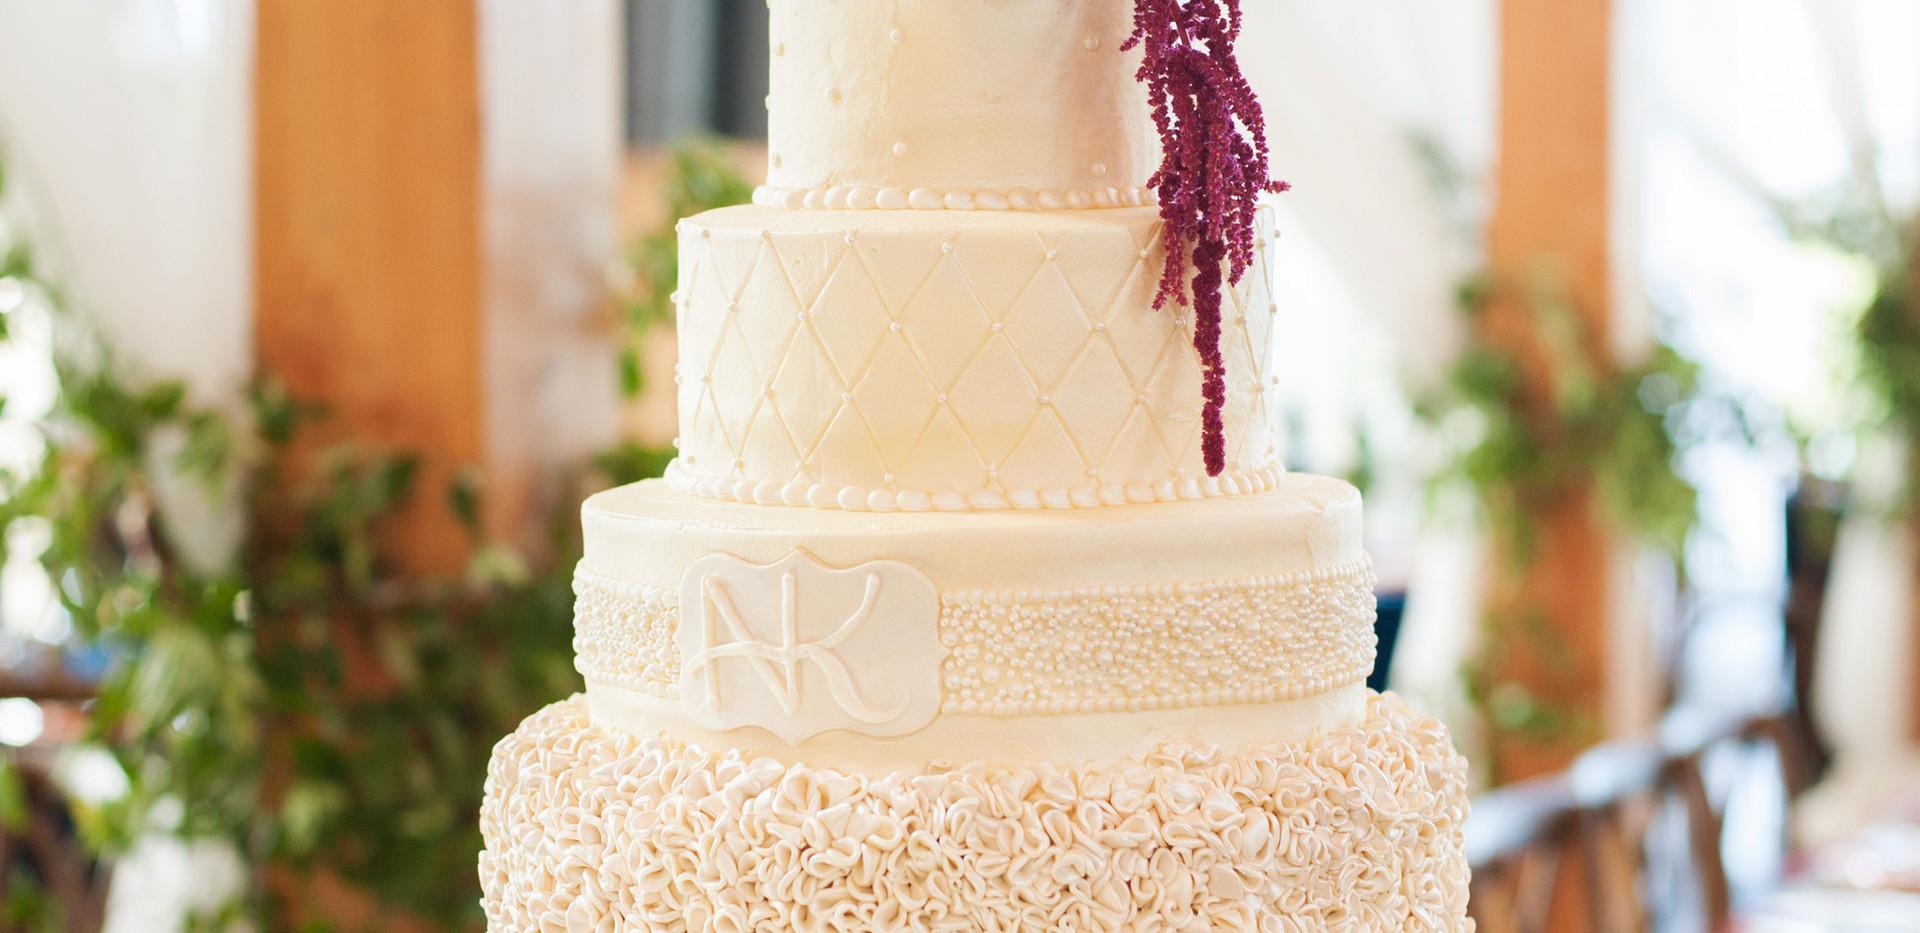 j-char-designs-wedding-cake-monogram.jpg